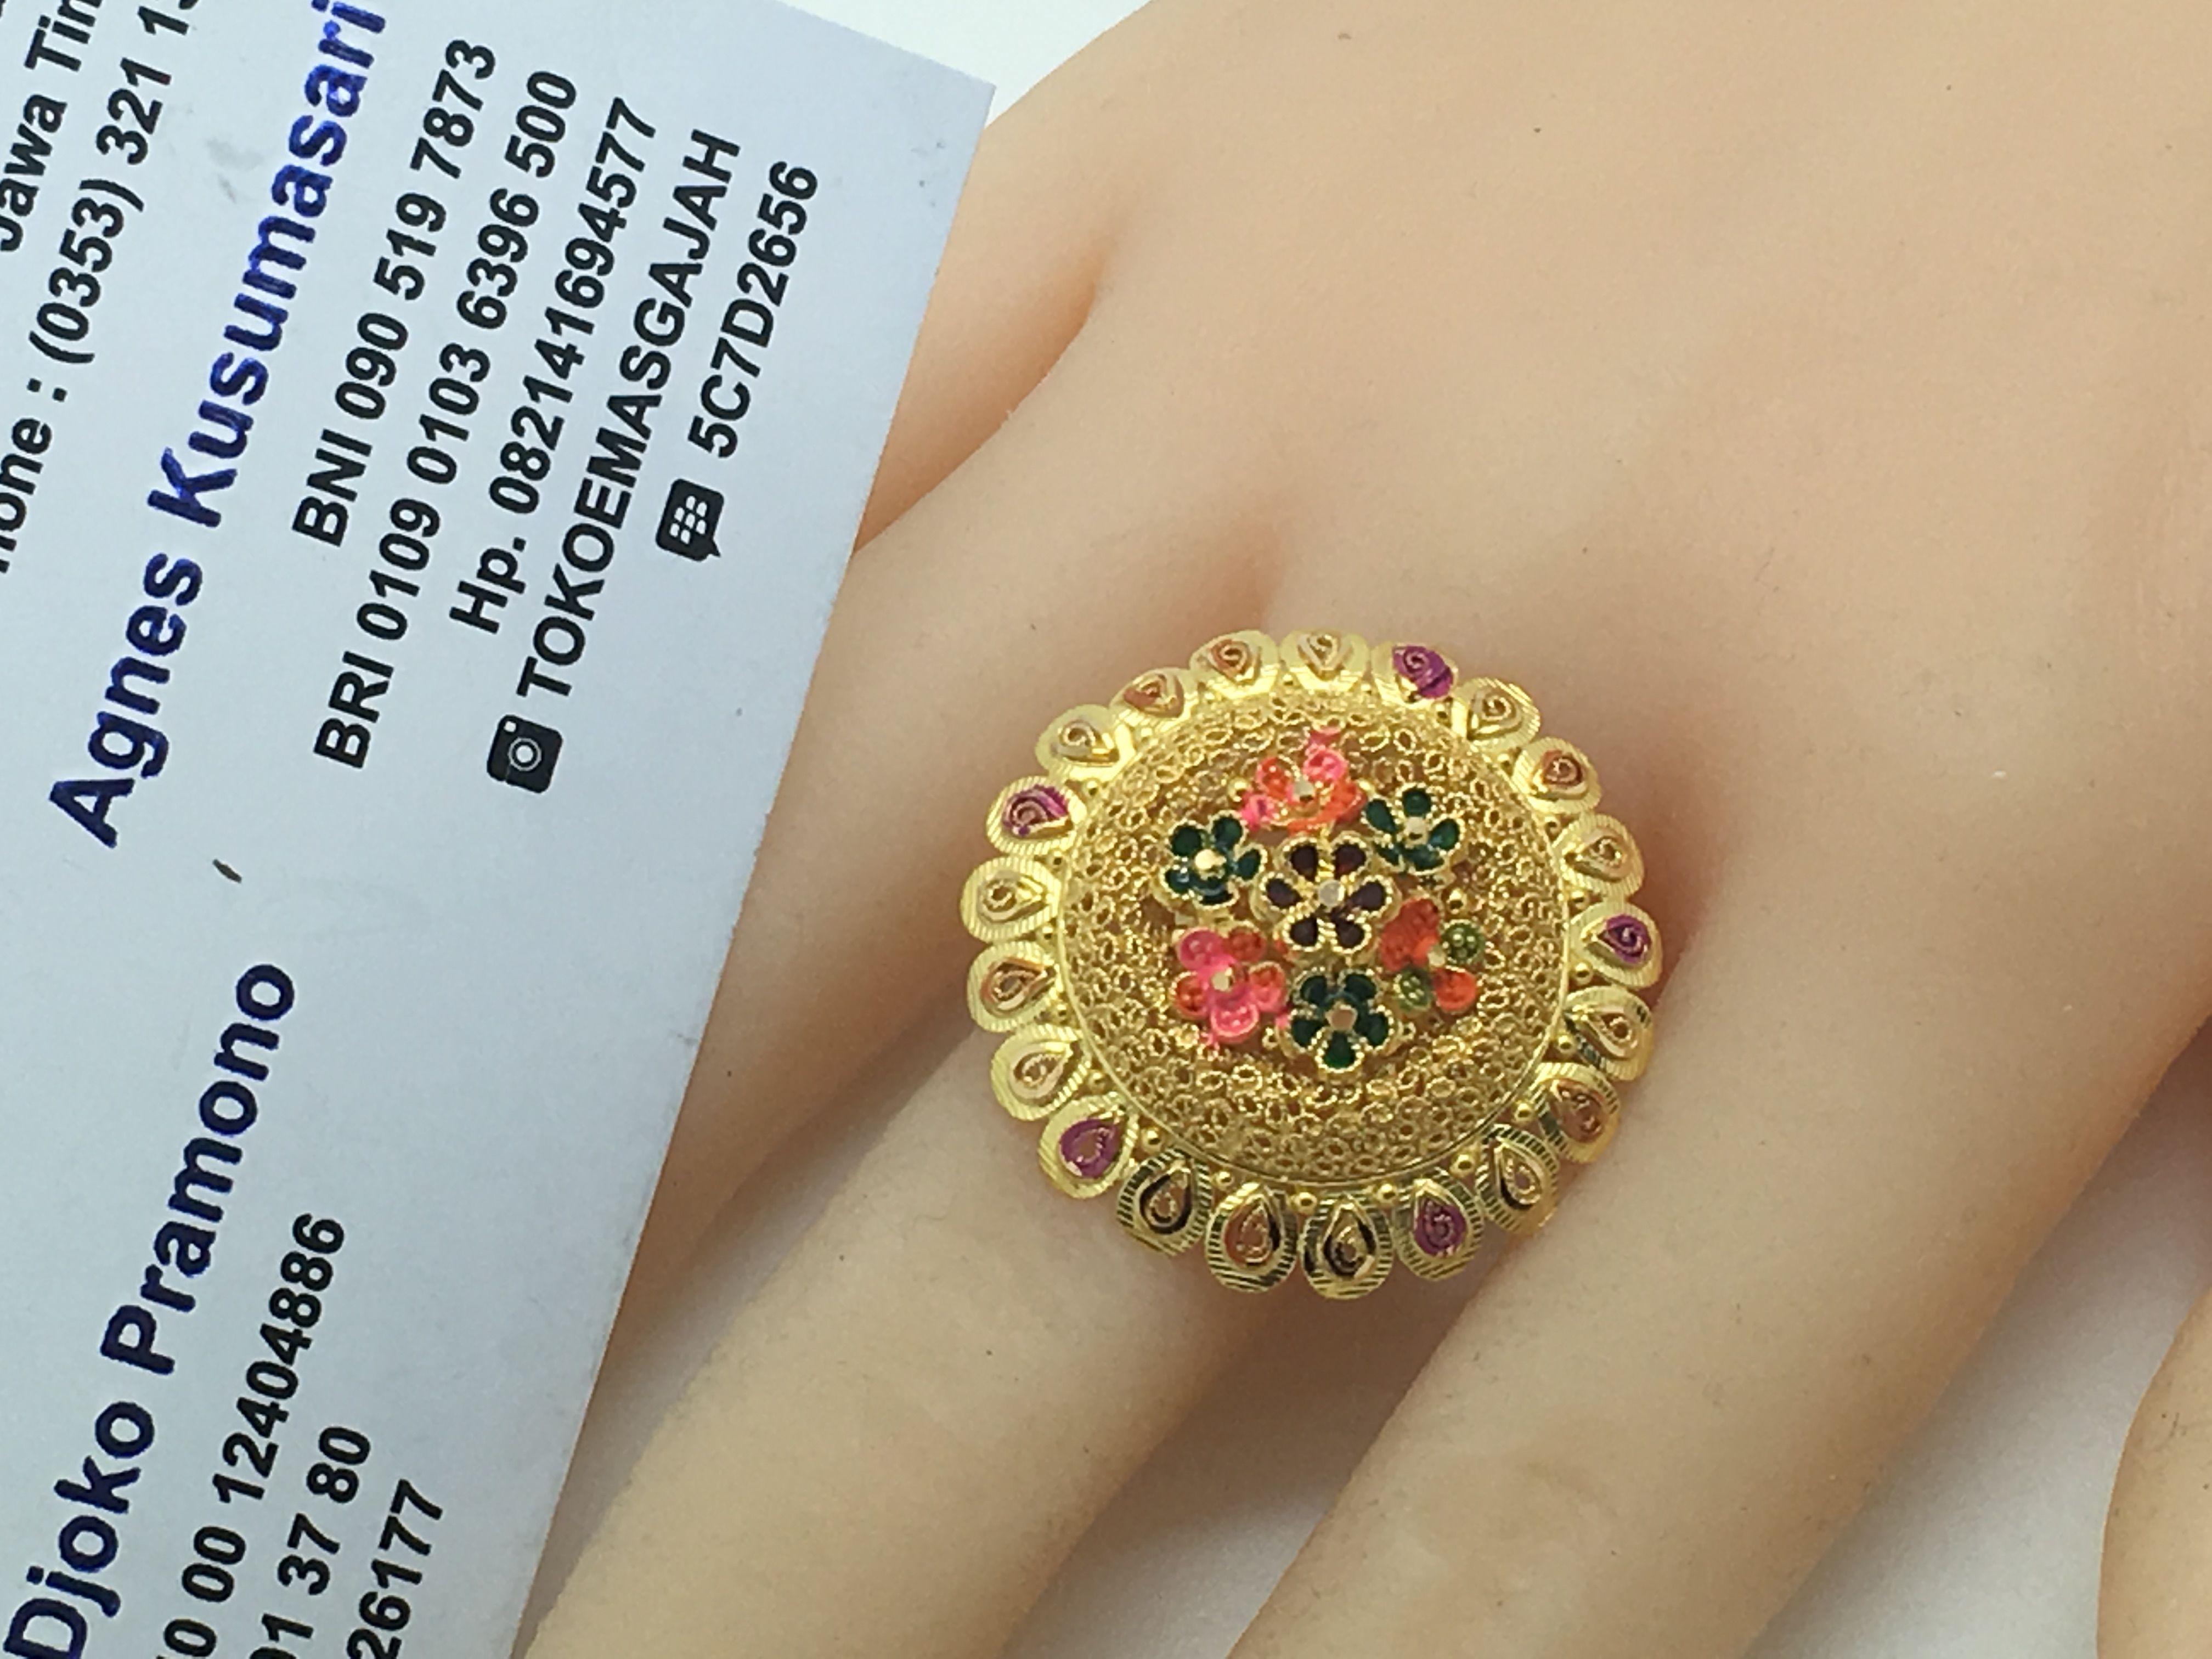 22k / 91,6 Gold Dubai / India Peacock Feather Ring size